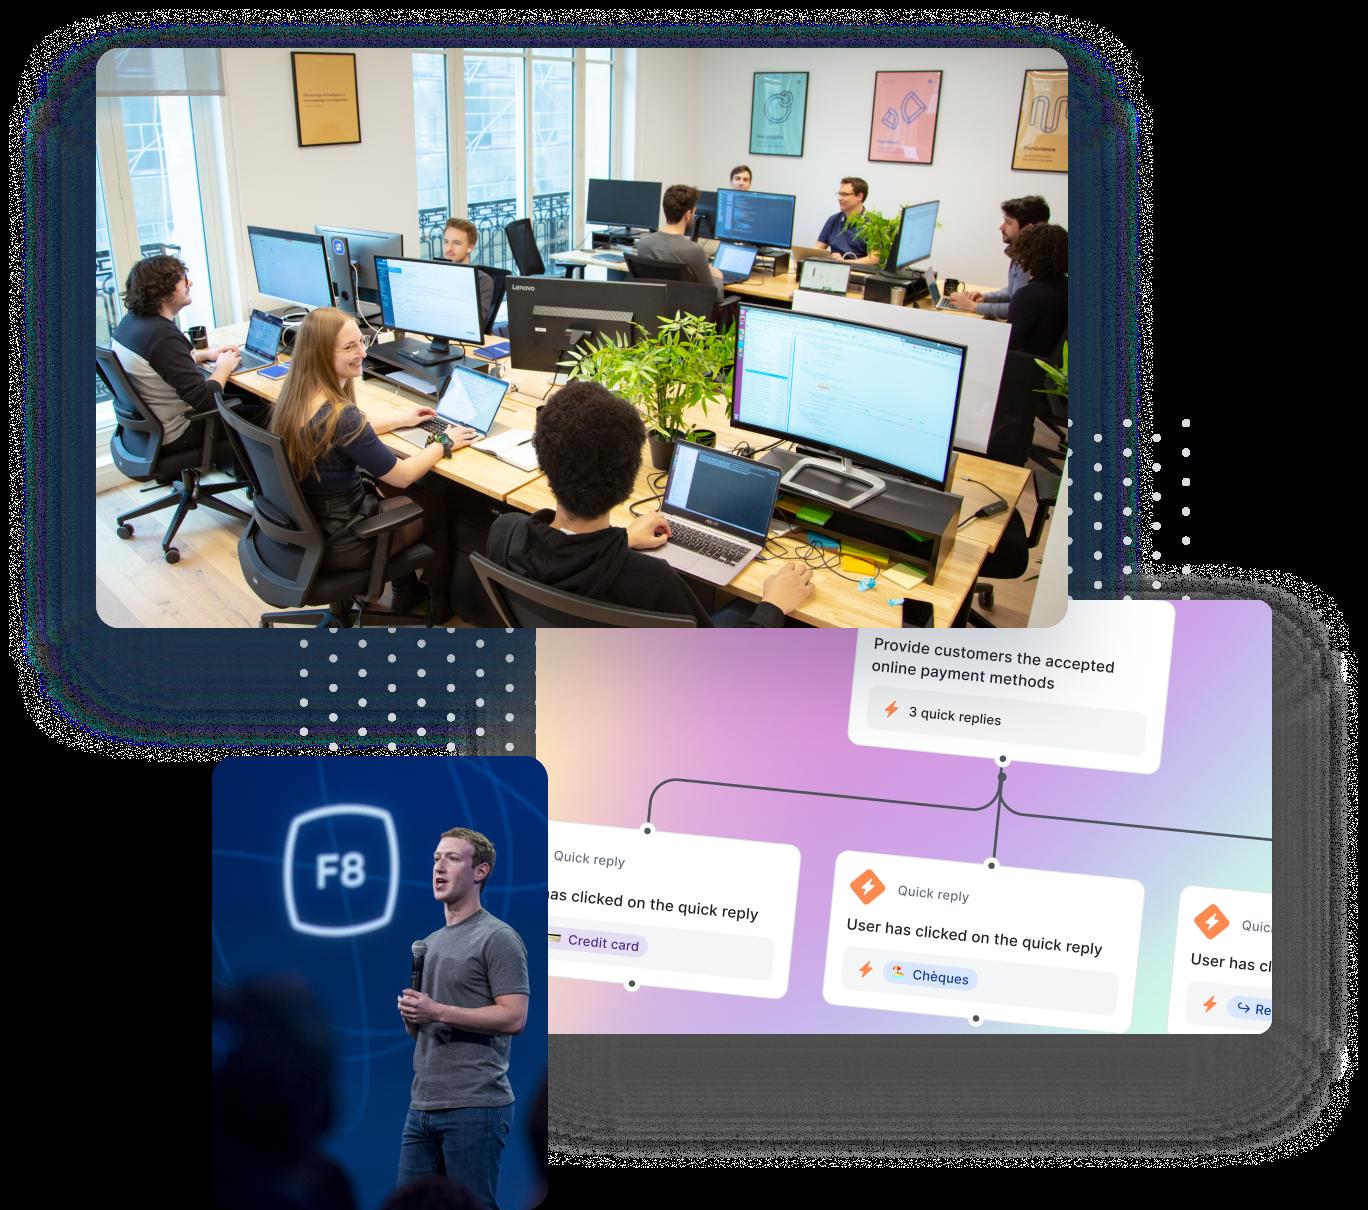 Team Discussing, Mark Zuckerberg at F8, and Mindsay Analytics Dashboard